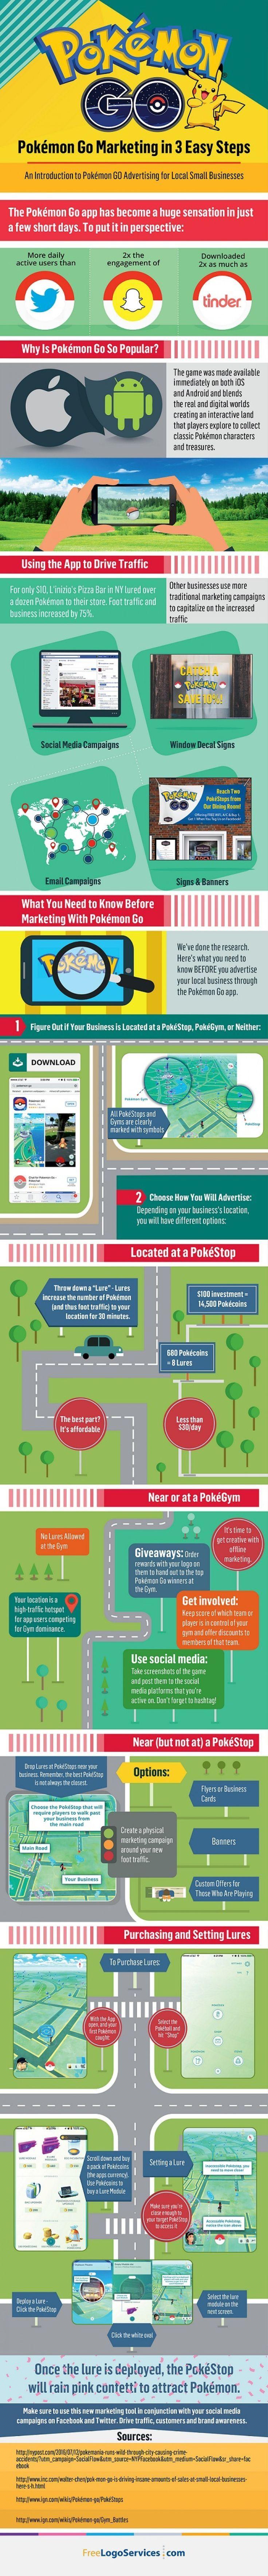 Pokemon Go Marketing in 3 Easy Steps  Infographic